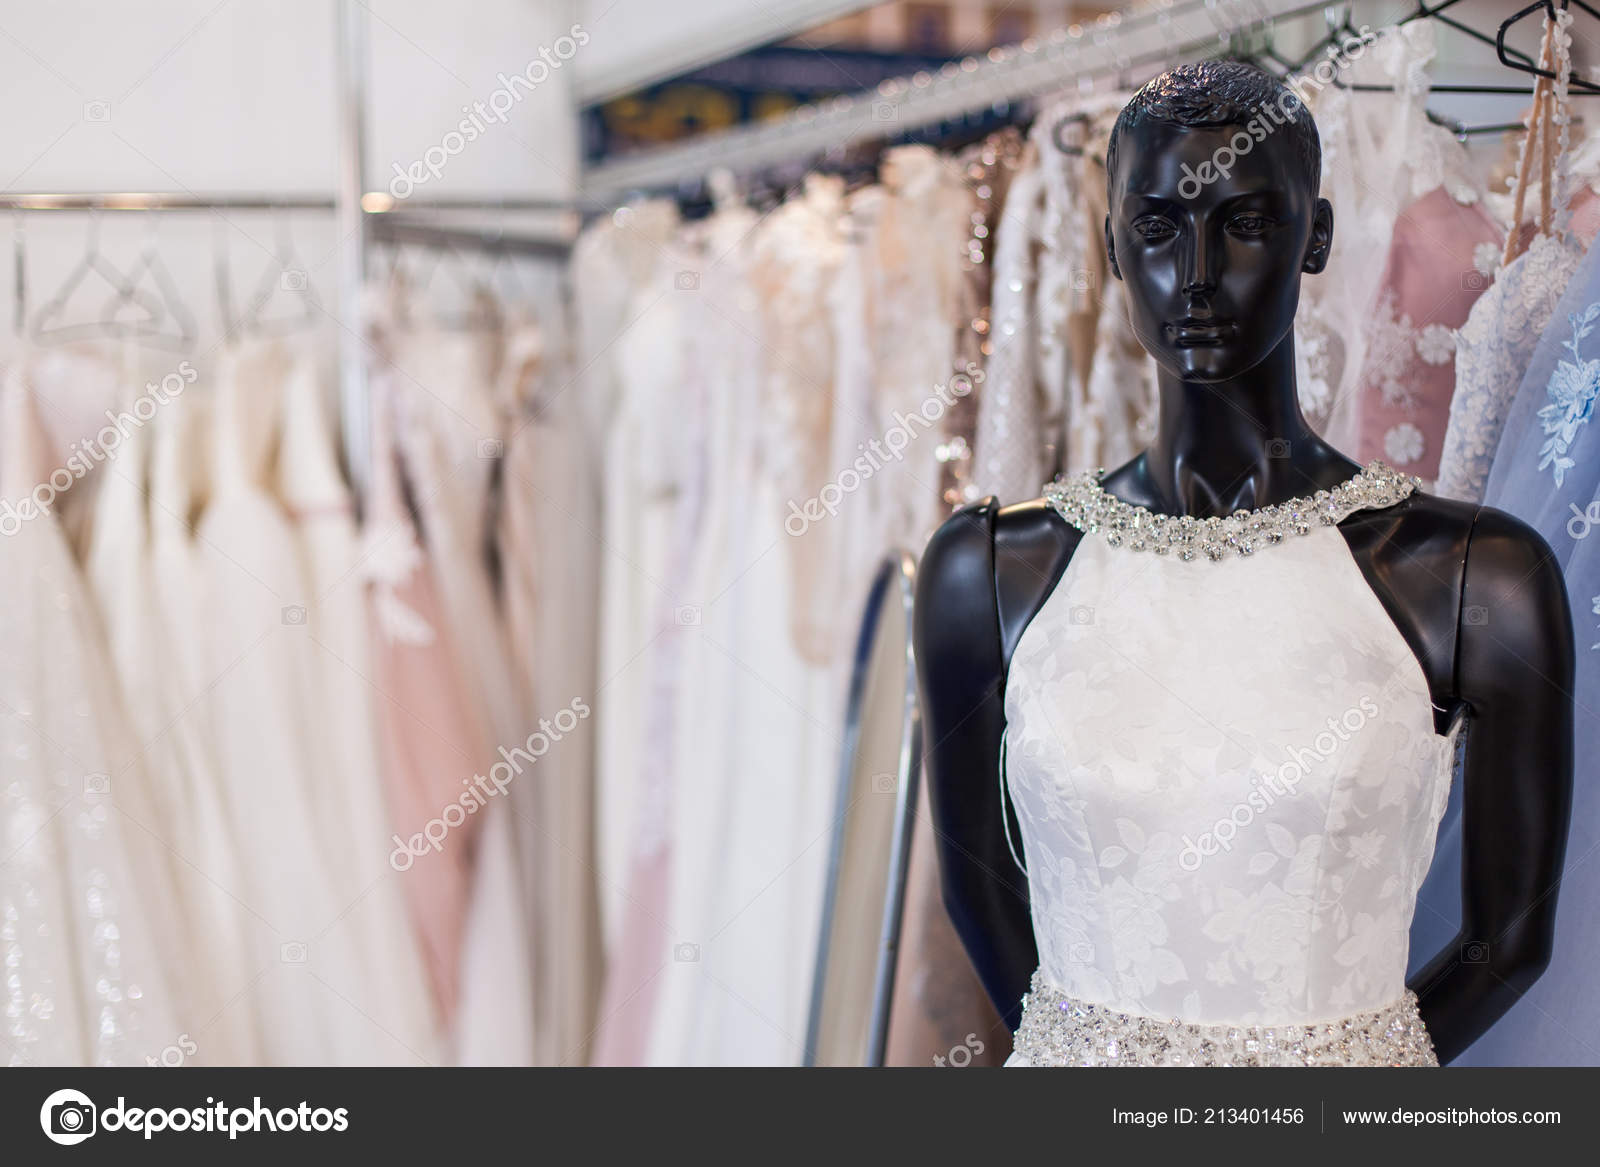 e2e61d590117 Νυφικό Ένα Μανεκέν Ανάμεσα Στα Ράφια Φορέματα — Φωτογραφία Αρχείου ...